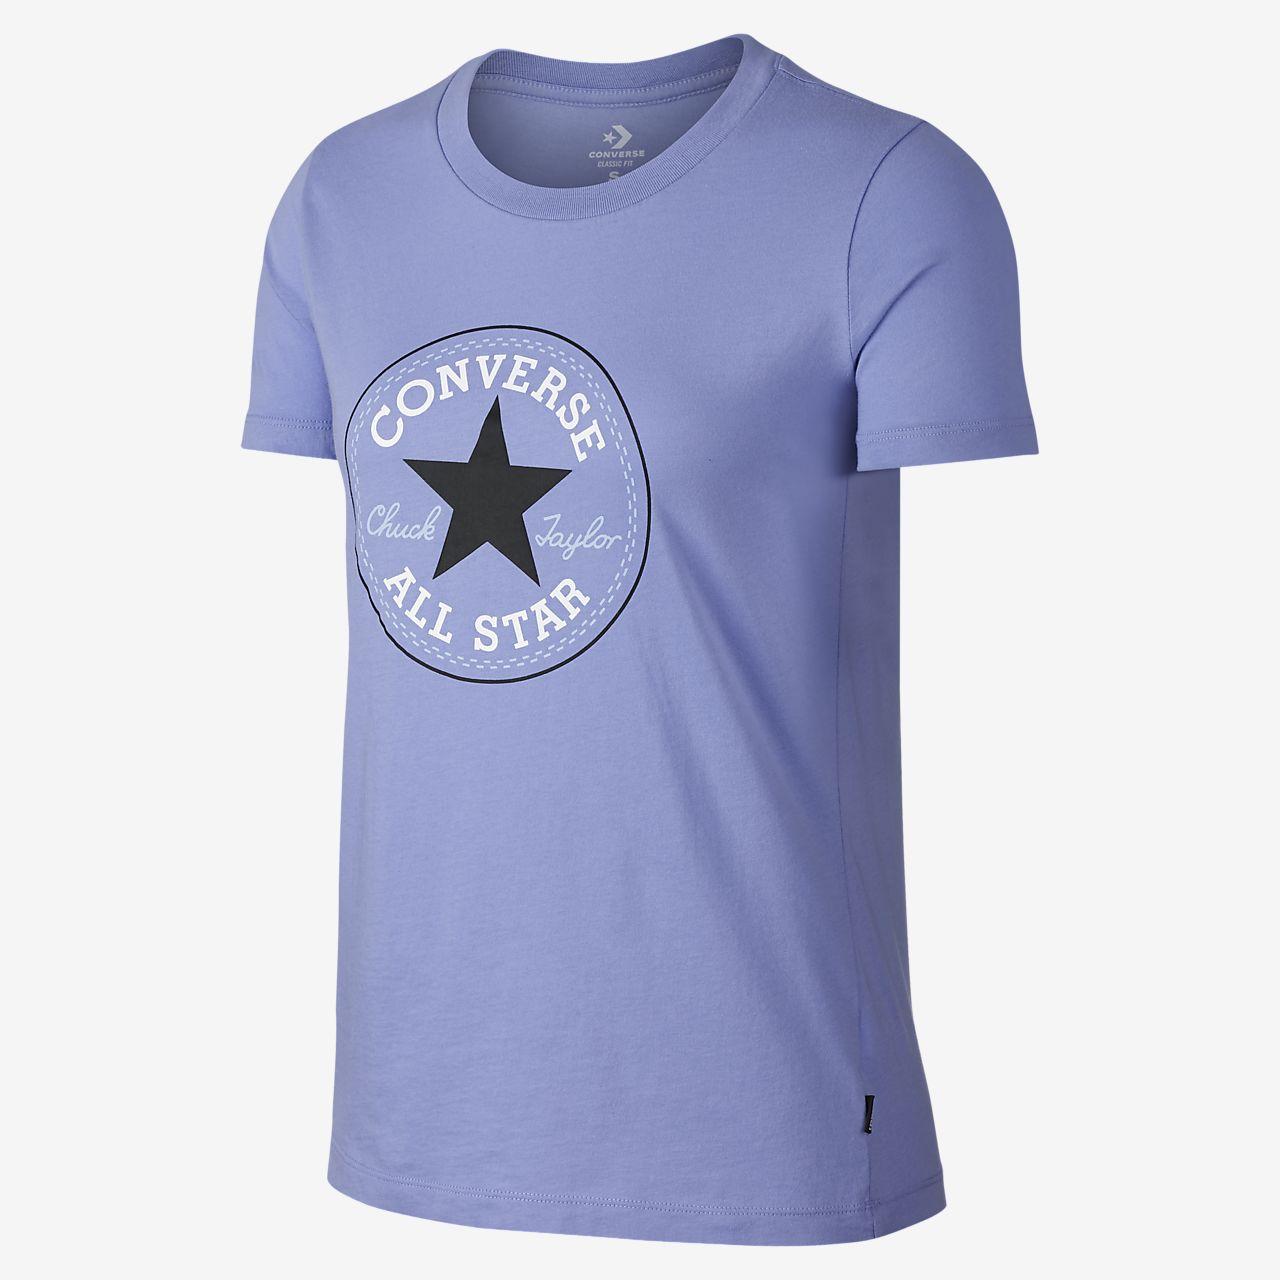 converse grey t shirt